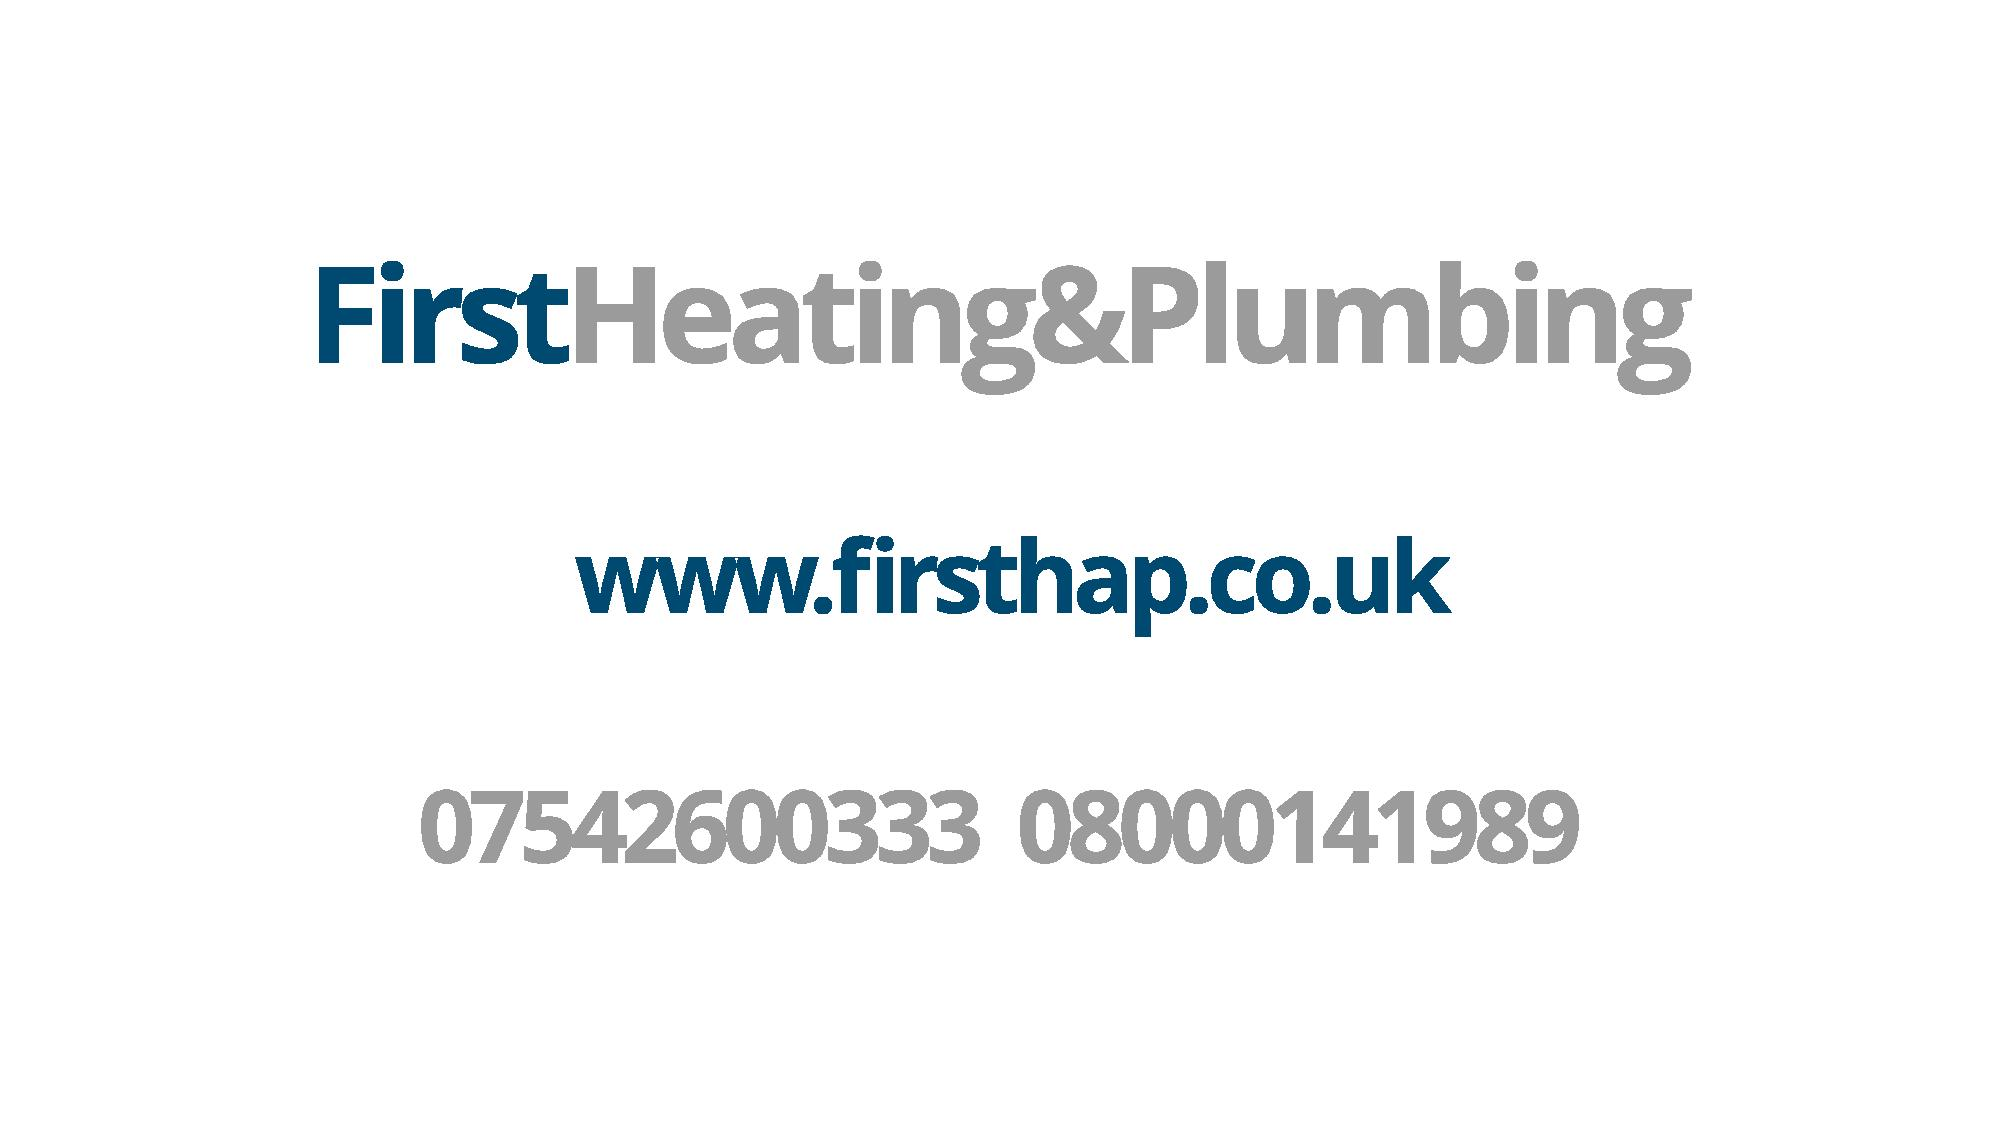 First Heating & Plumbing